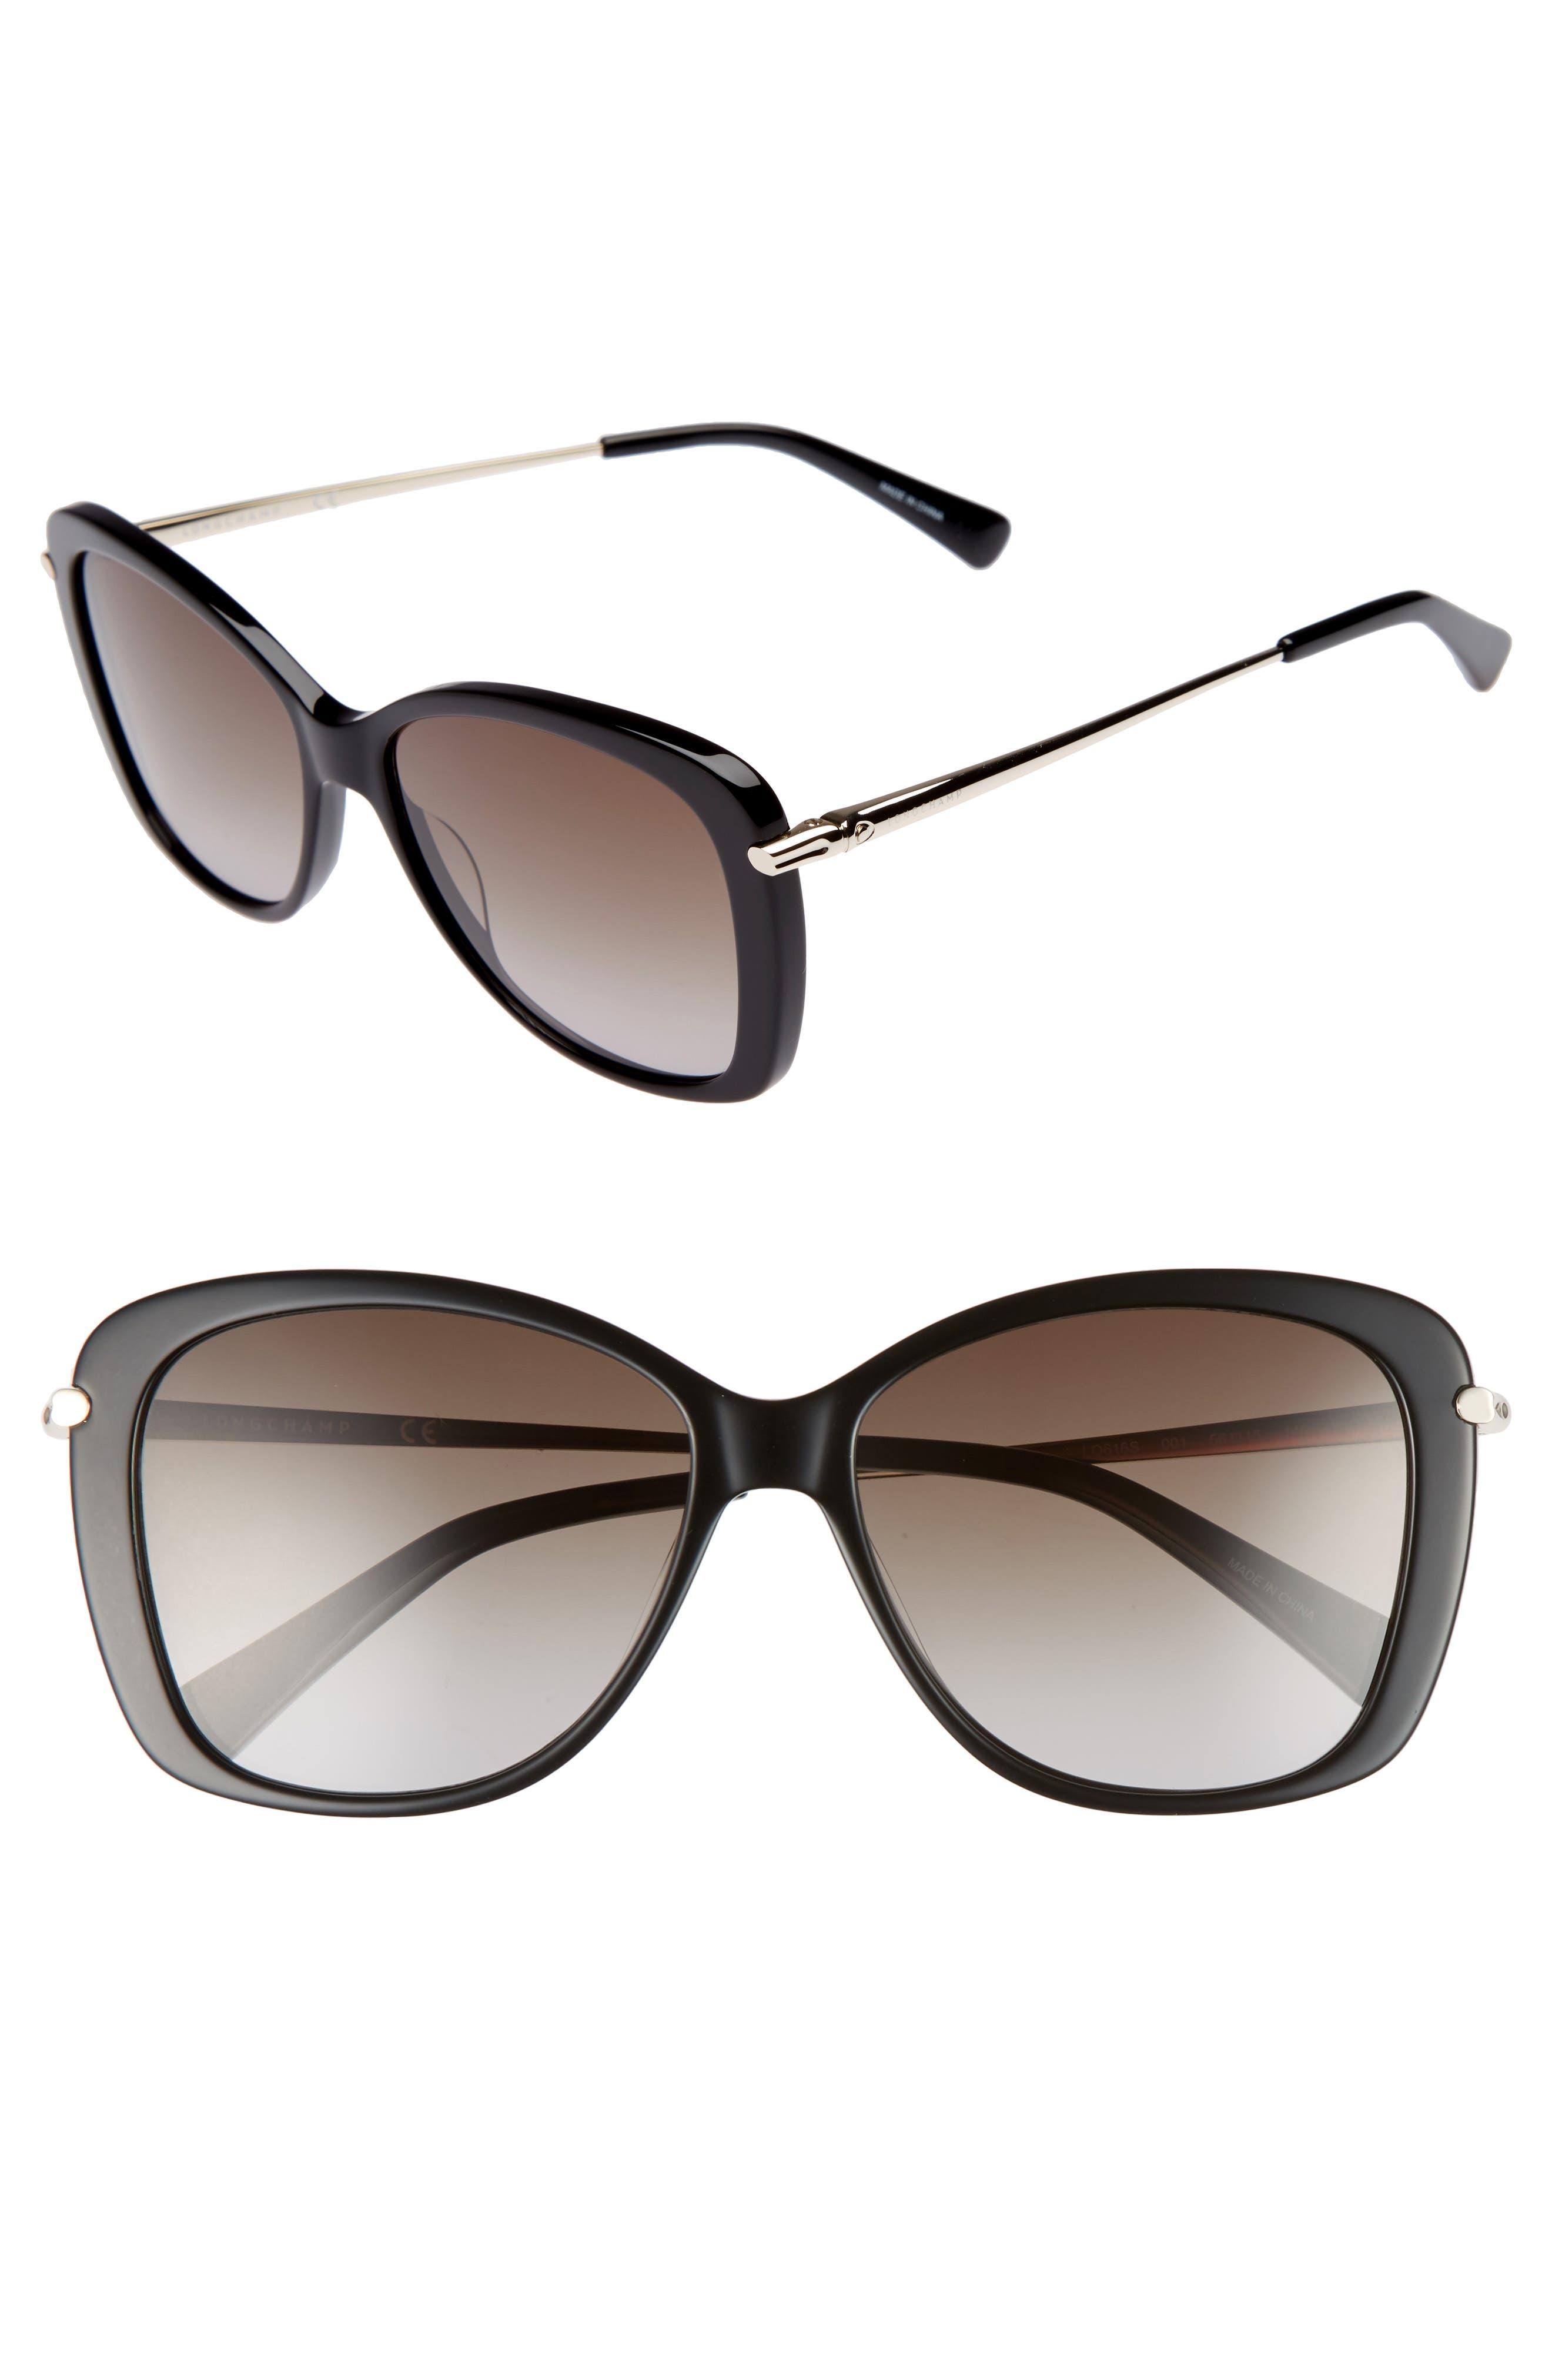 56mm Gradient Lens Butterfly Sunglasses,                             Main thumbnail 1, color,                             BLACK